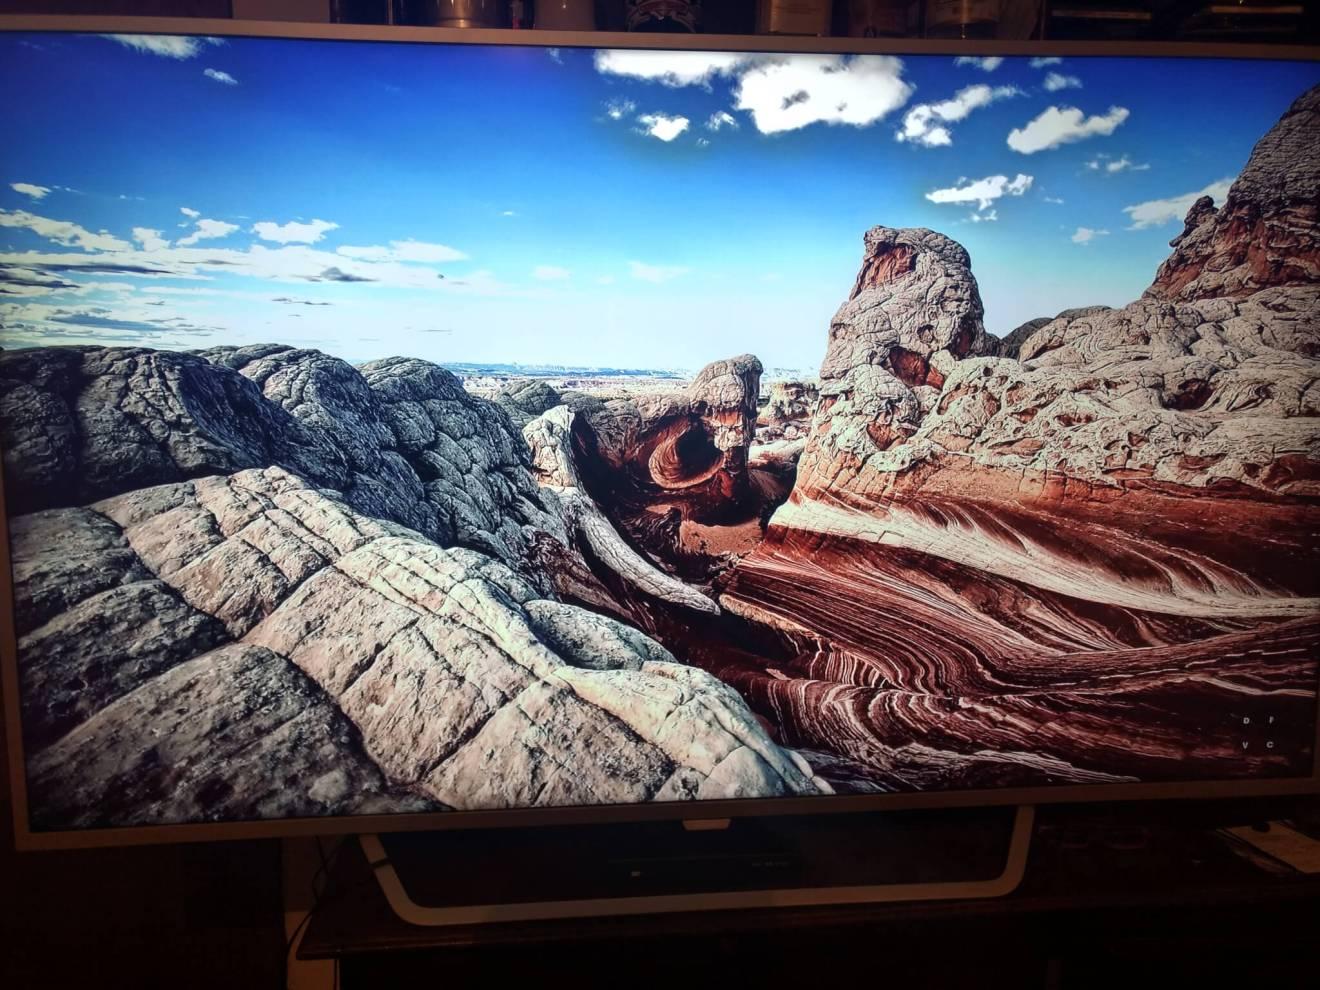 IMG 20180629 232312053 HDR - Review: TV LED Ambilight Philips 65PUG6412/78 entrega experiência impressionante